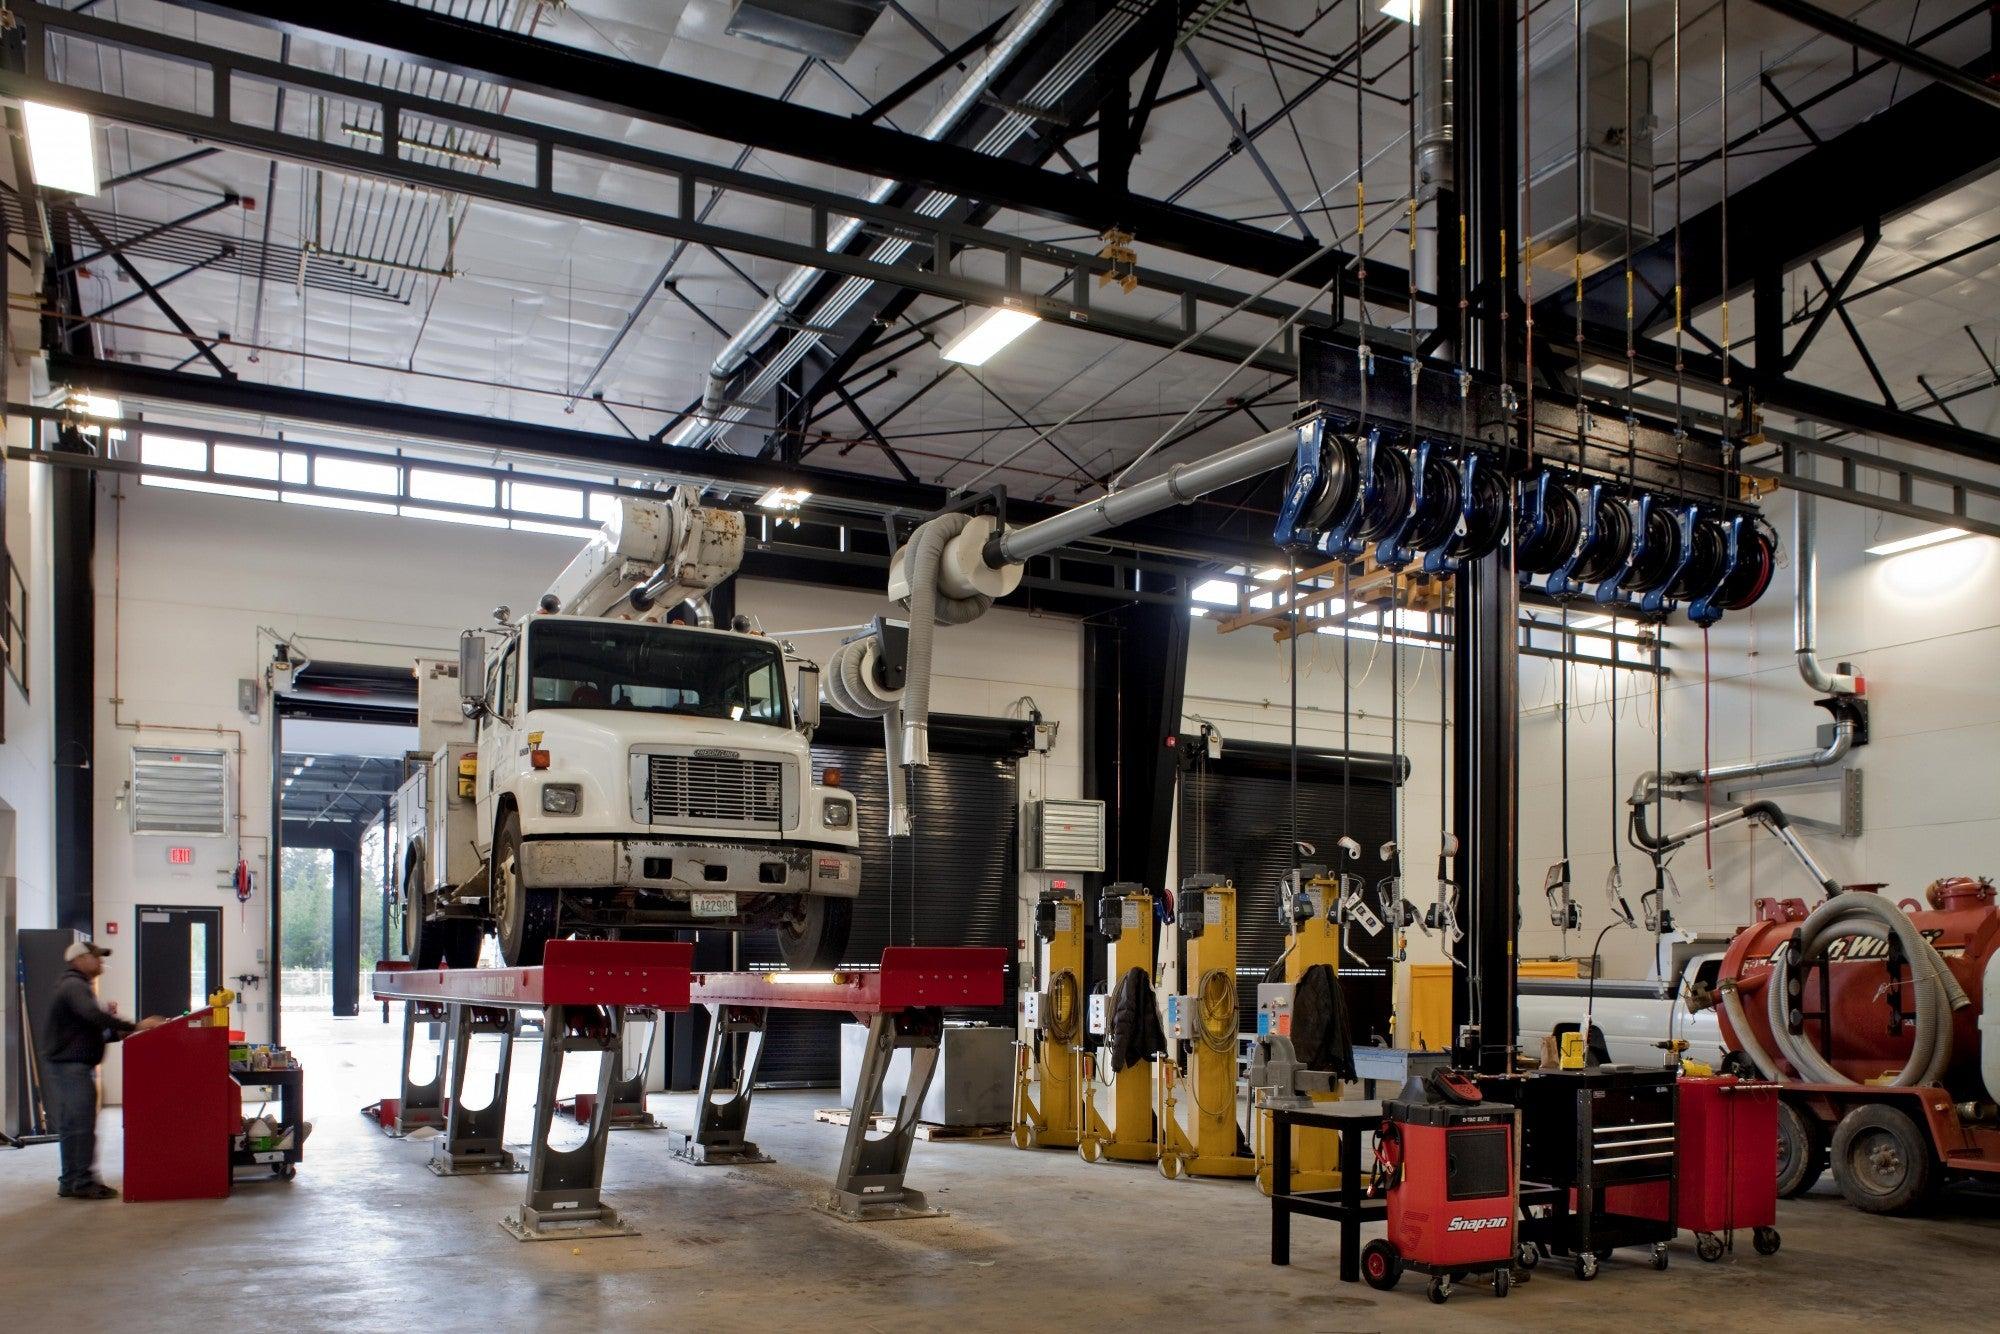 John's Prairie Operations Center 3